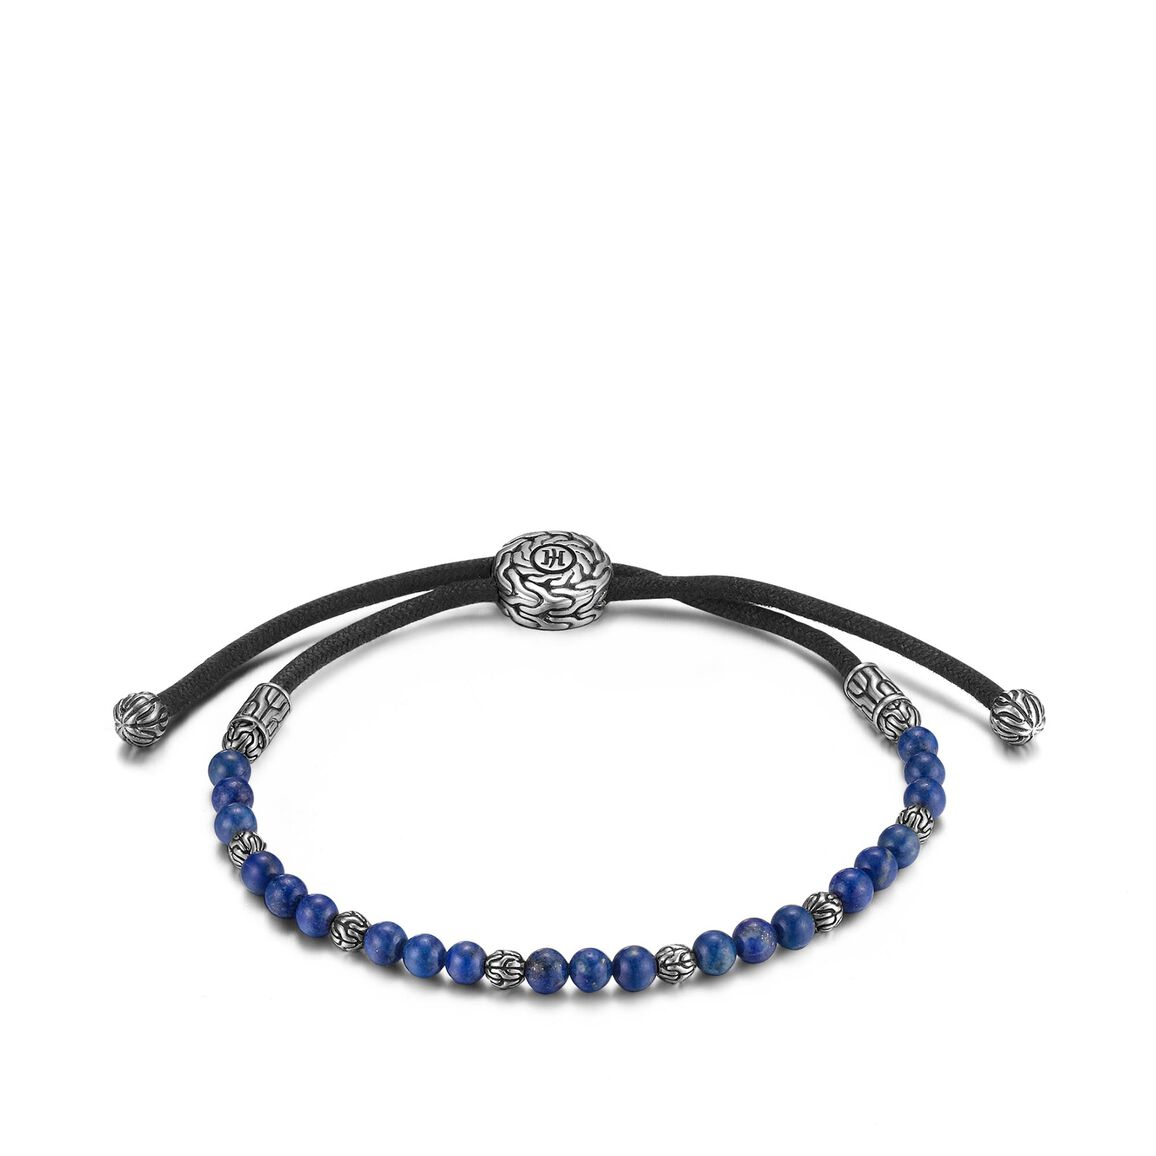 s classic chain bead bracelet in silver